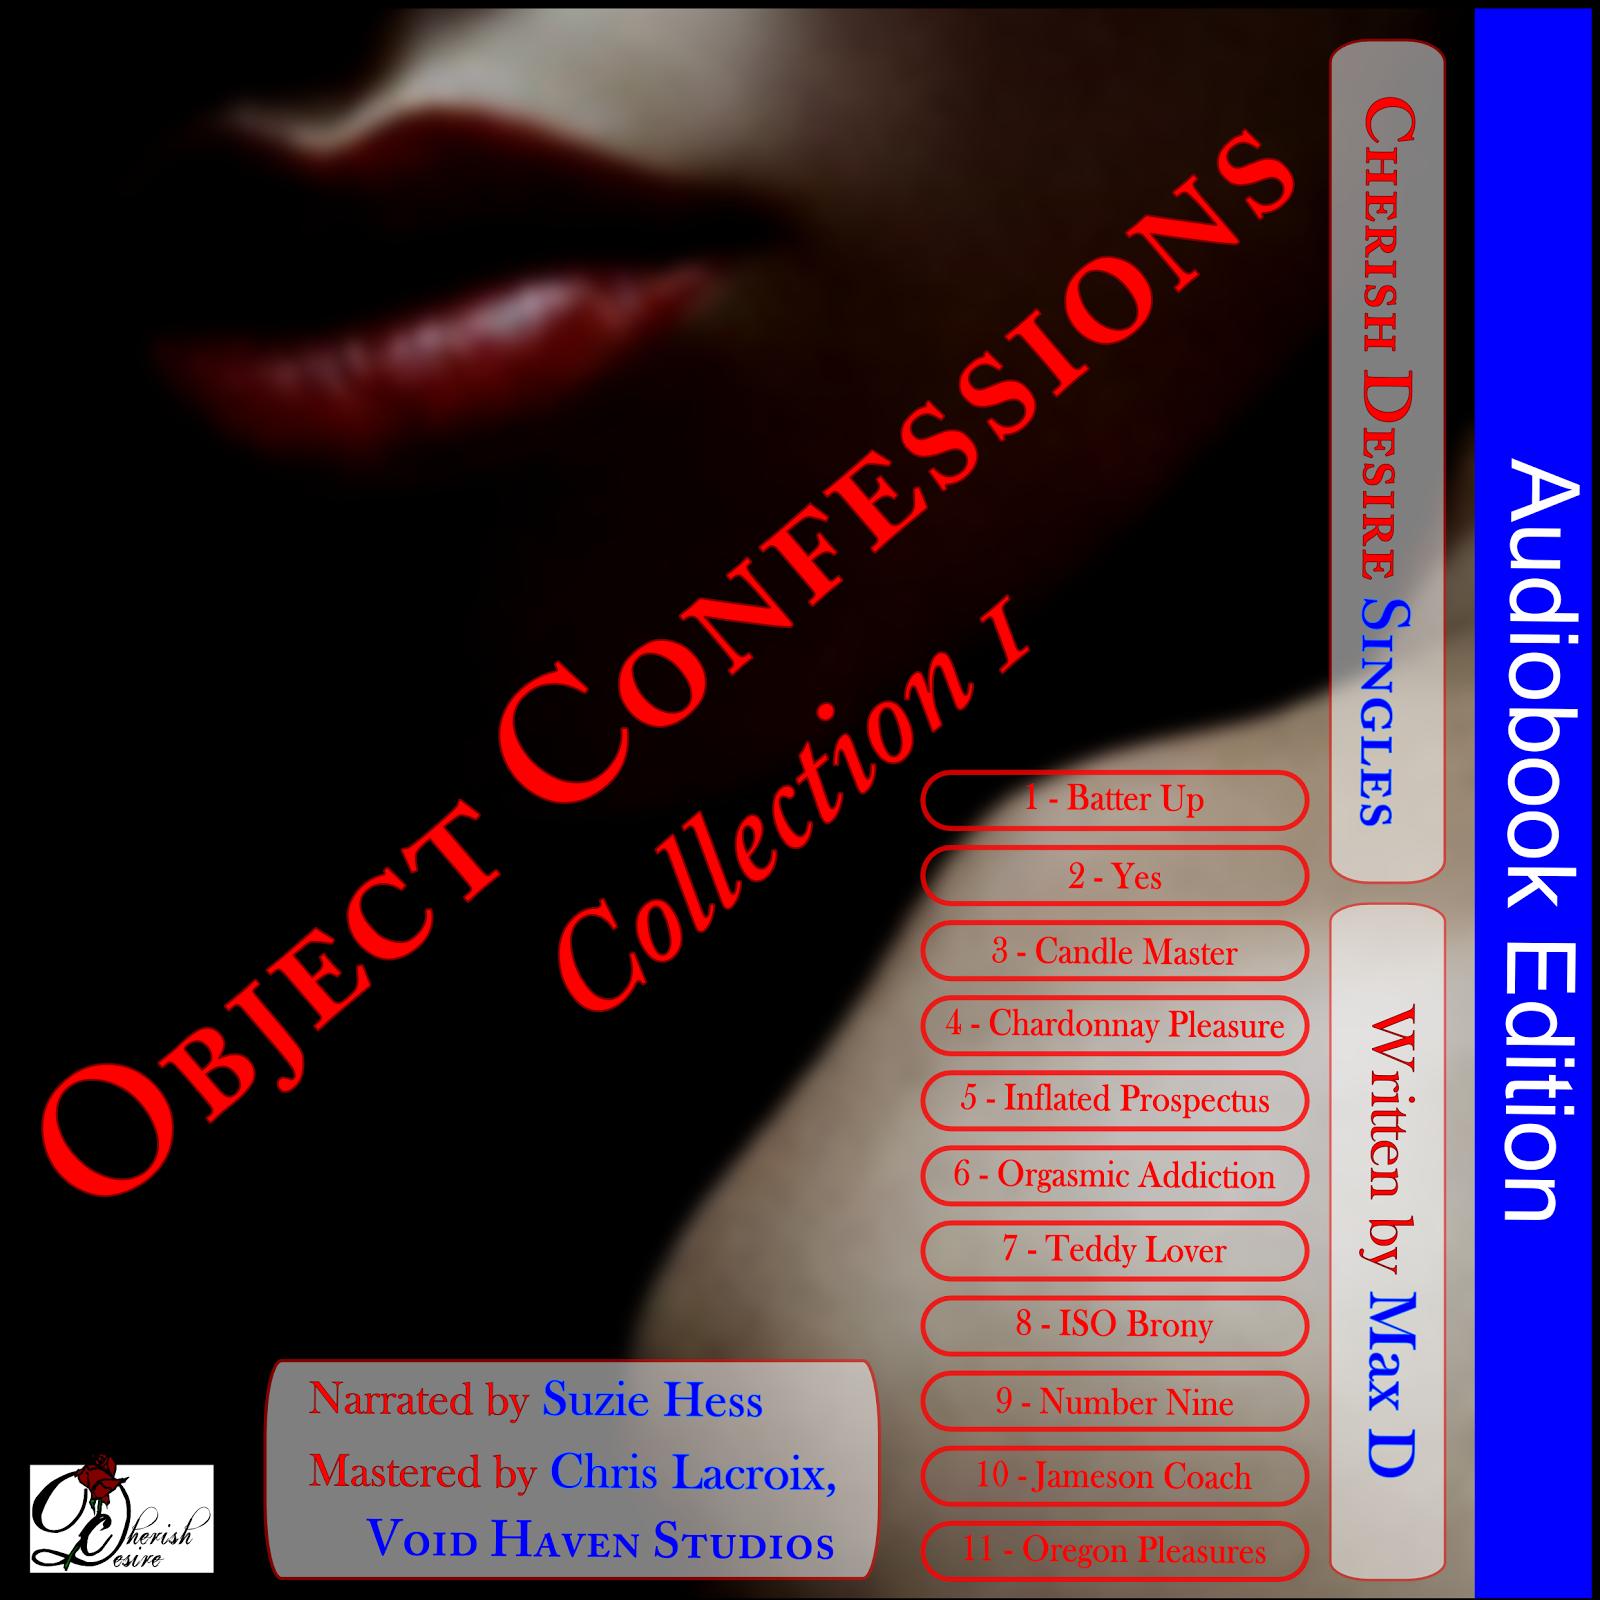 Cherish Desire Singles: Object Confessions Collection 1 Audiobook, Max D, erotica